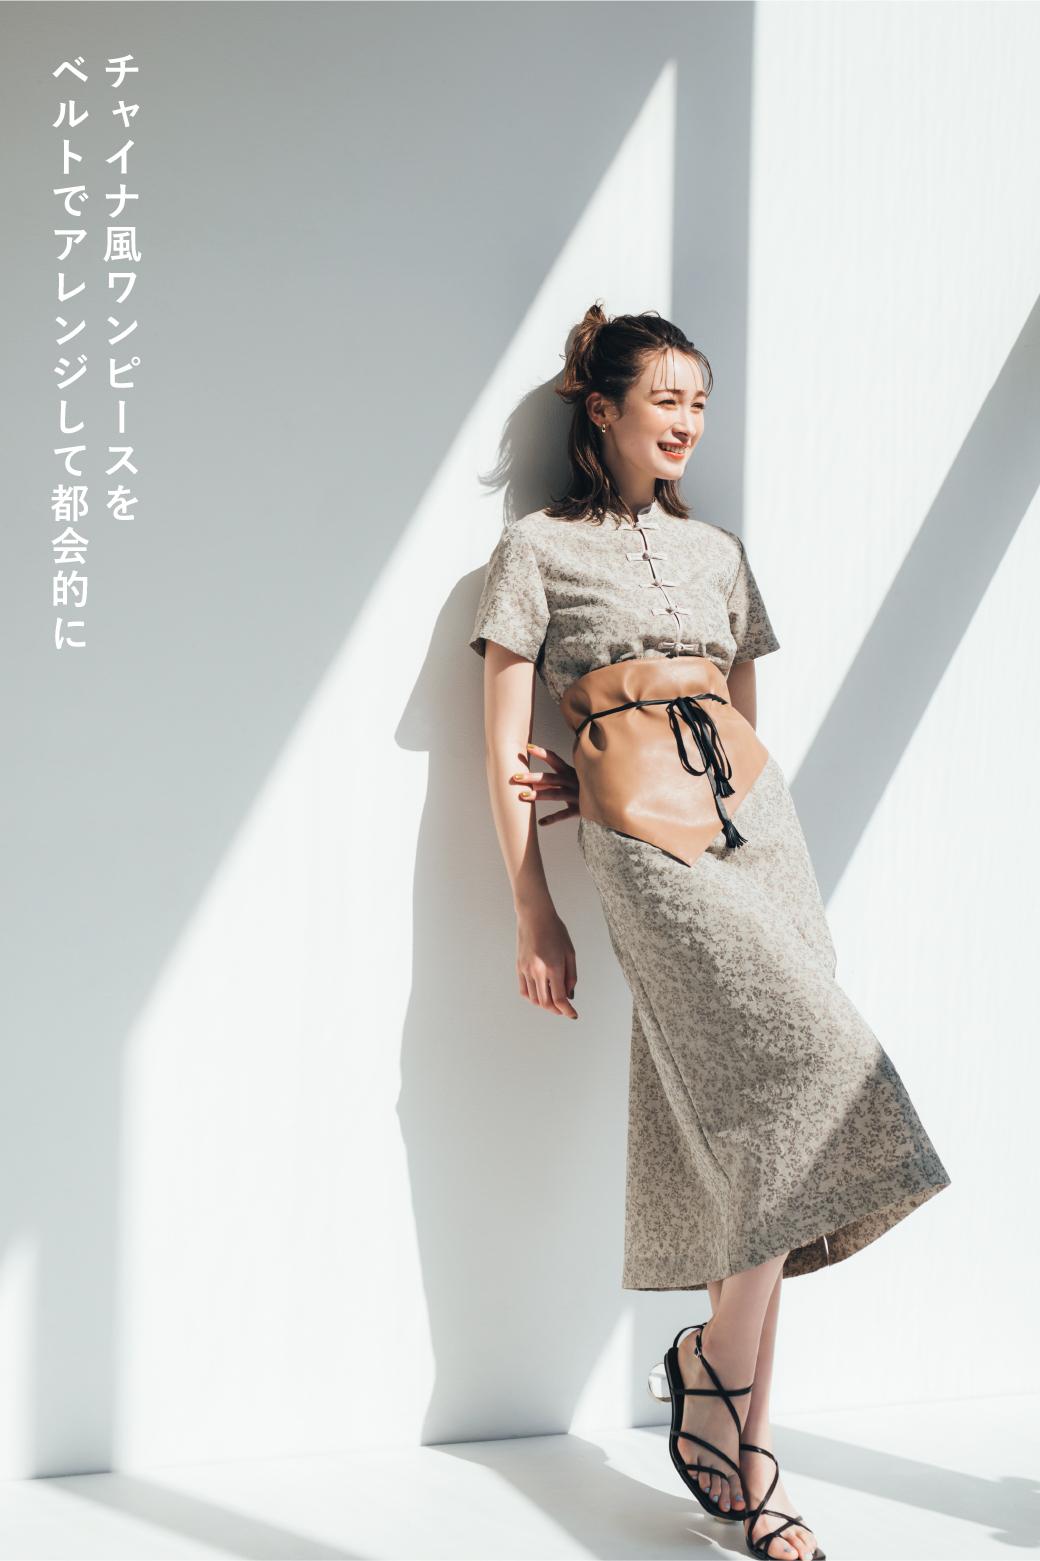 sachi fujiii